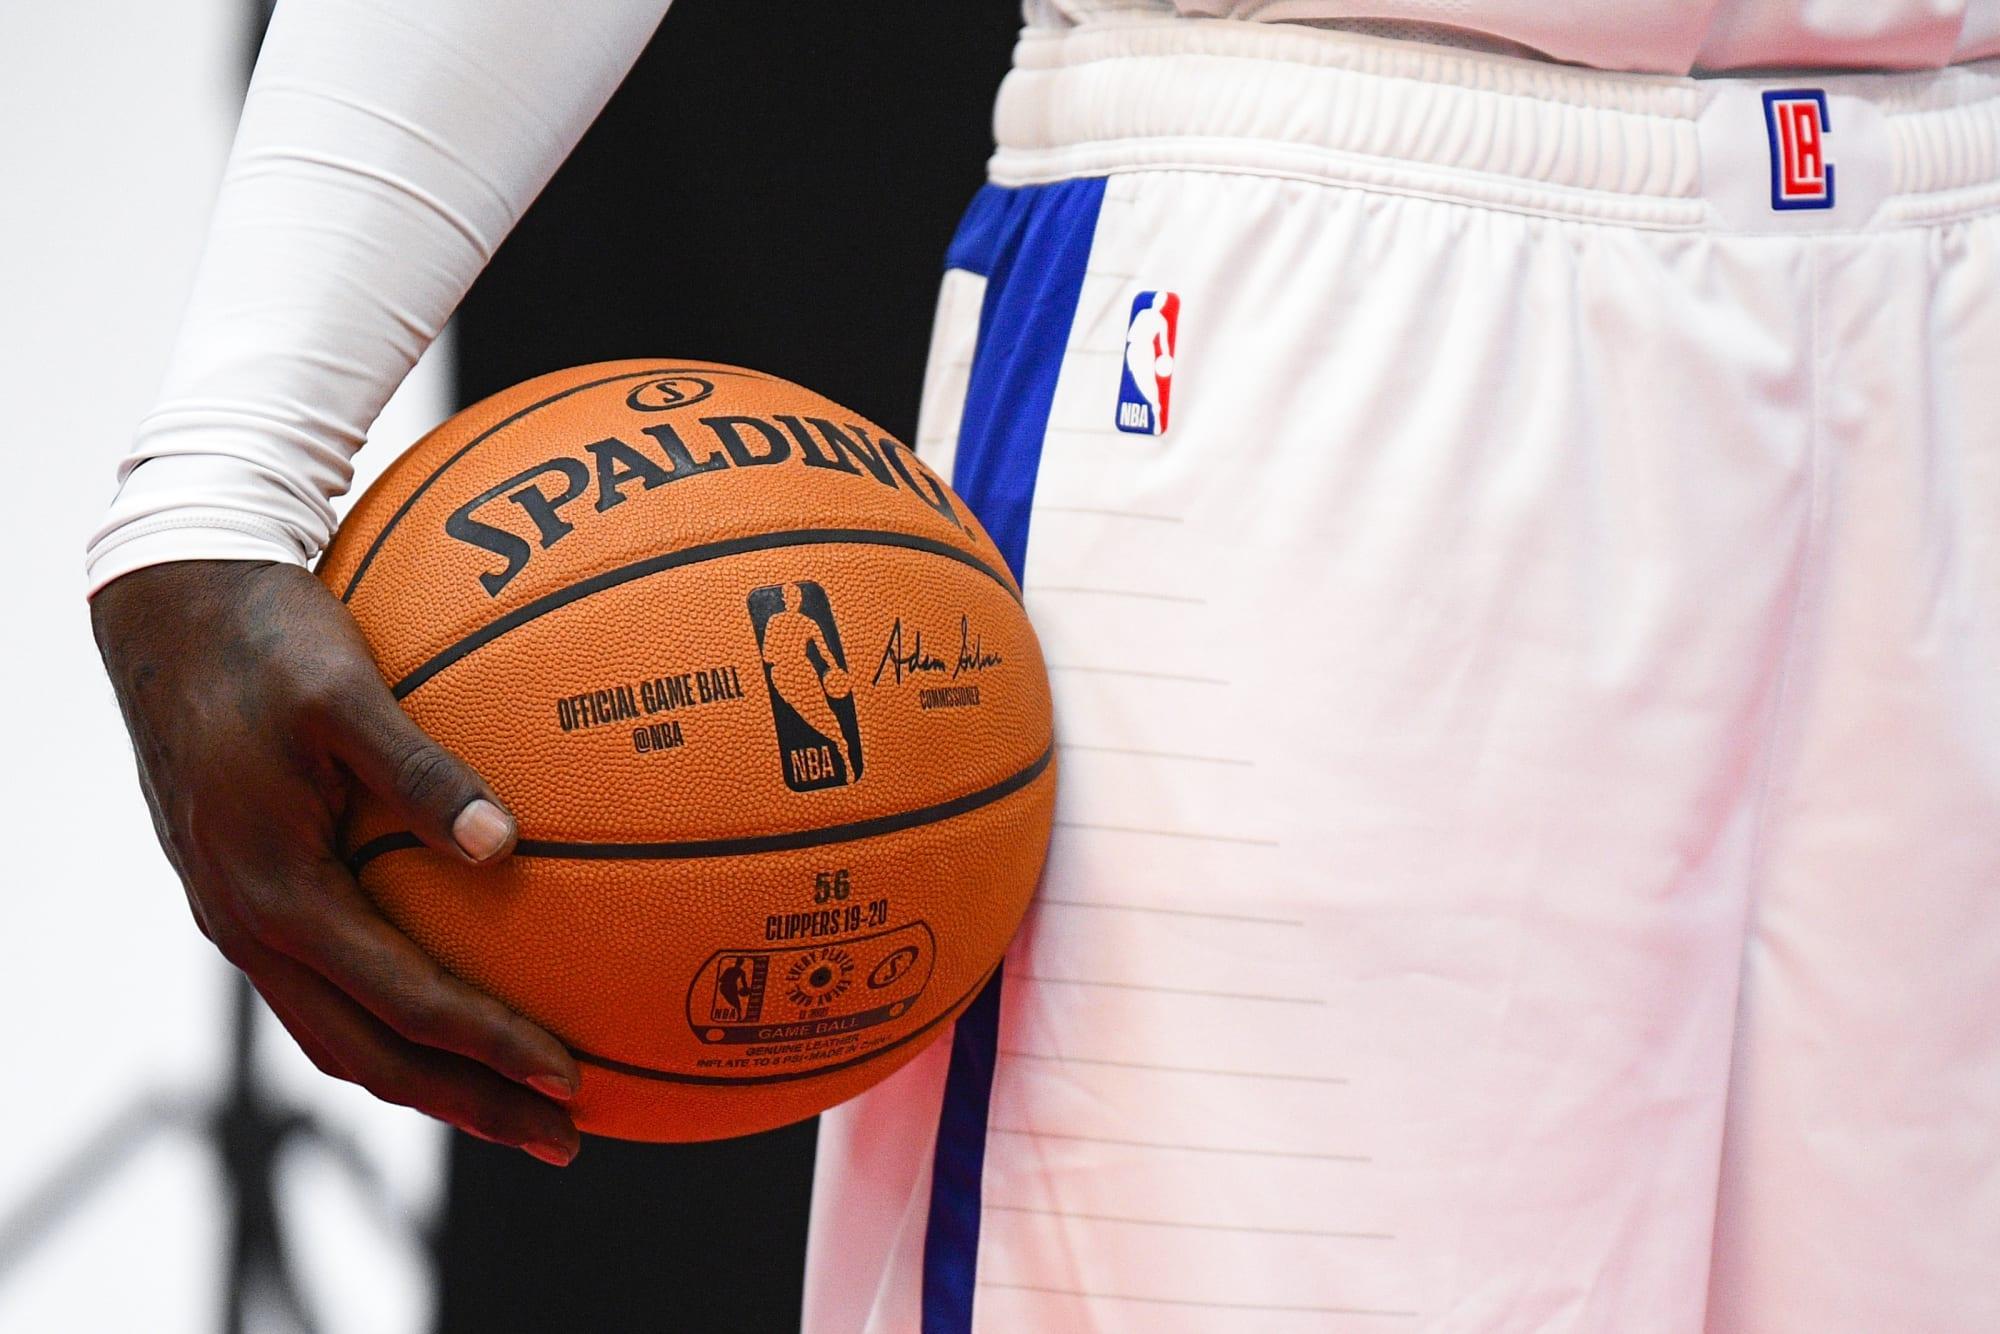 LA Clippers: The best NBA return scenario for the team